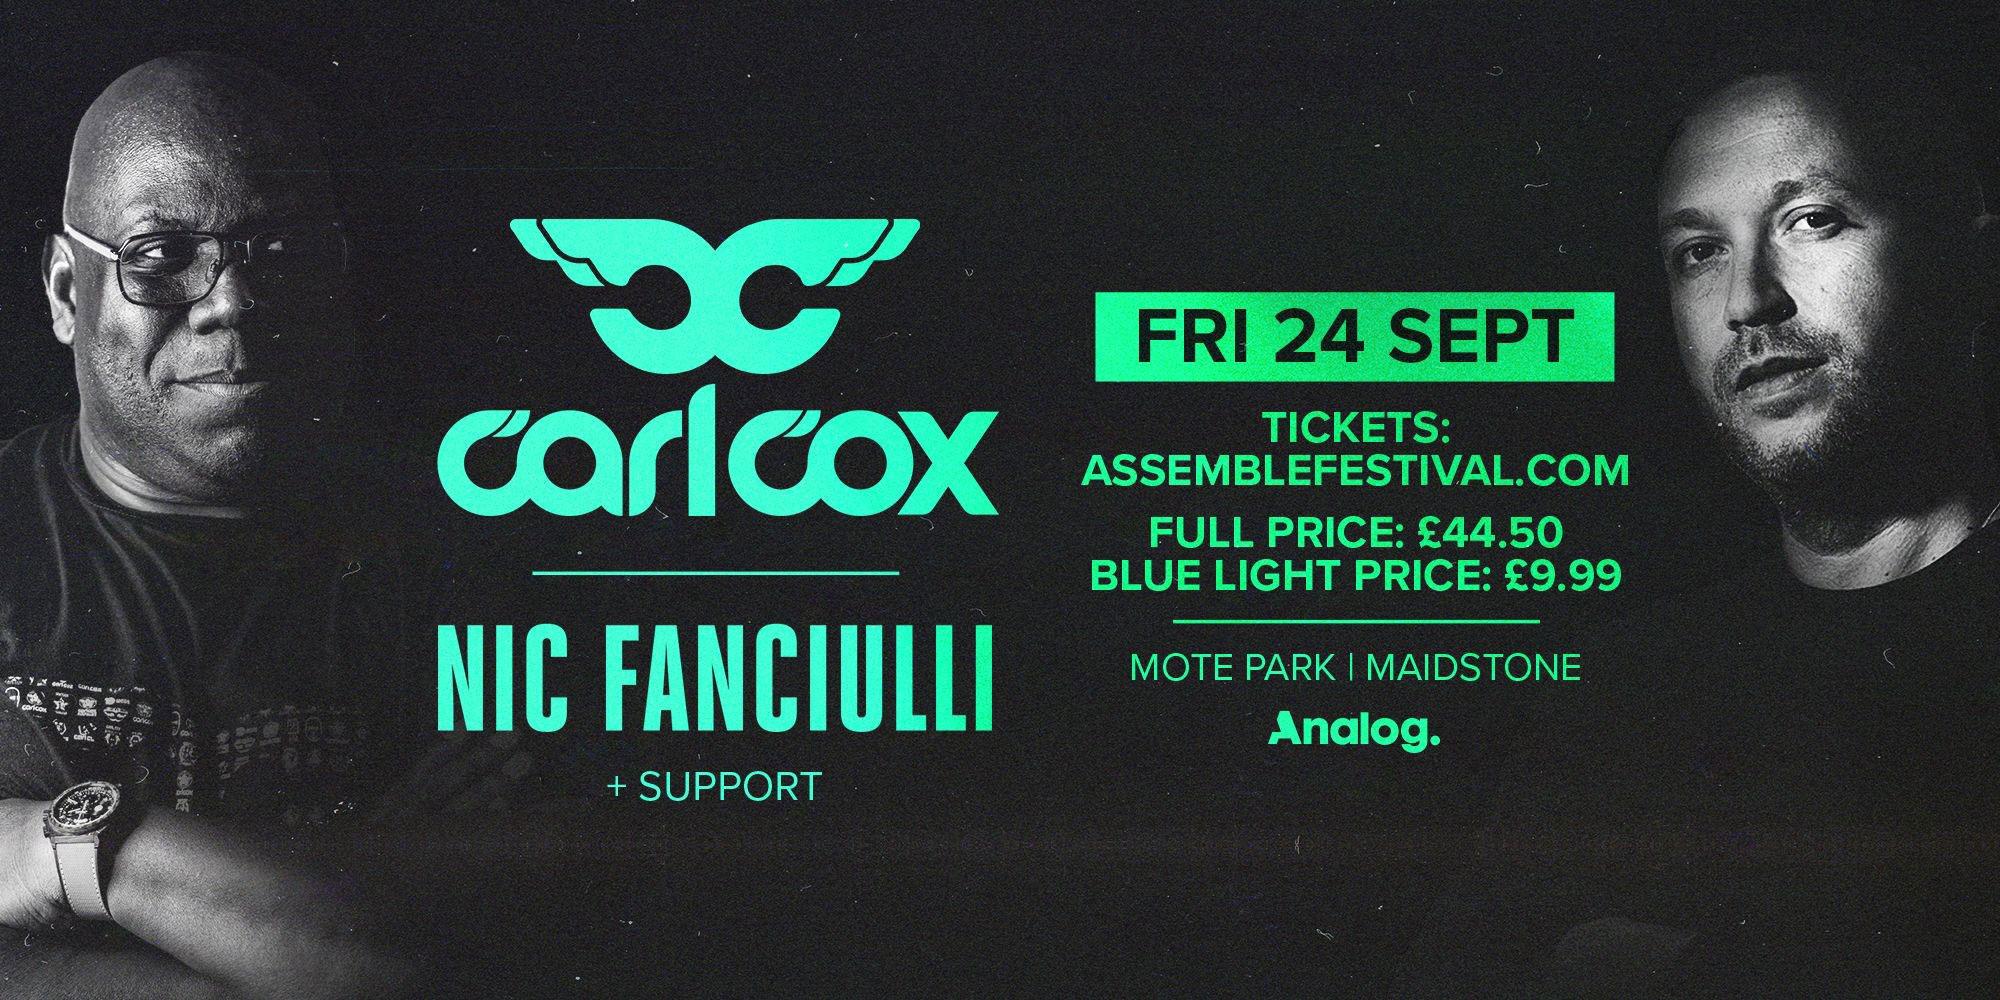 Carl Cox & Nic Fanciulli + Support